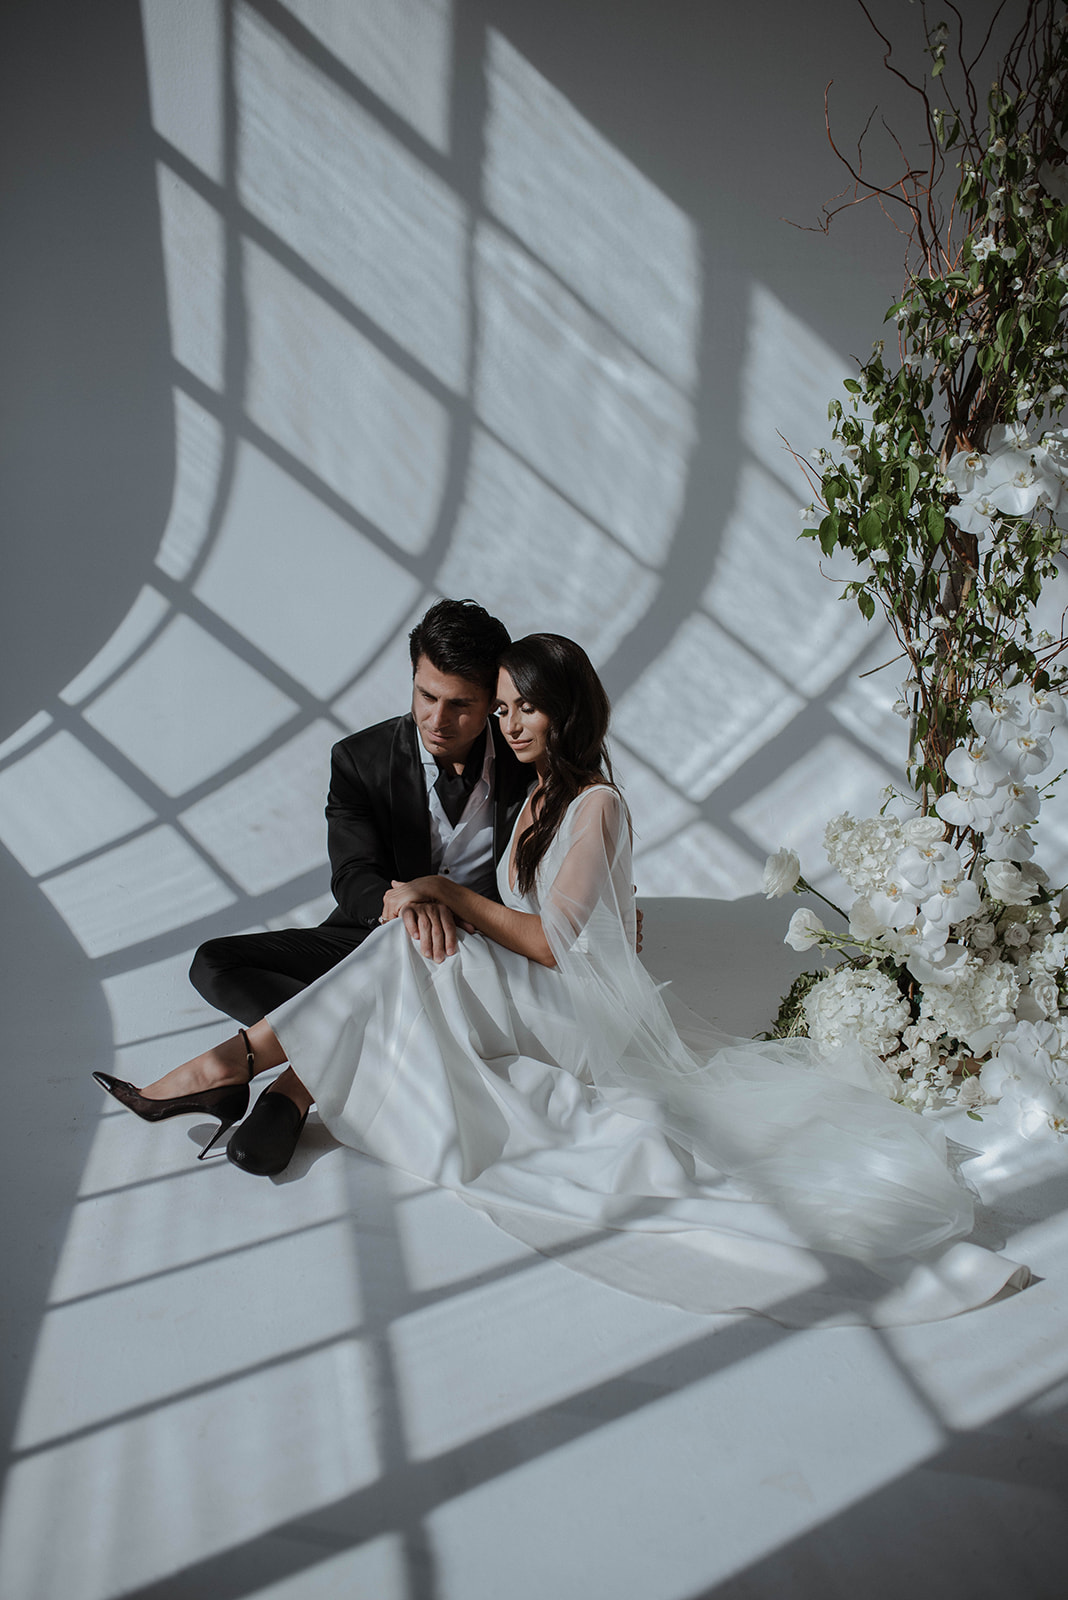 Jenna___Austin_Wedding_Day-_LHP-665.jpg